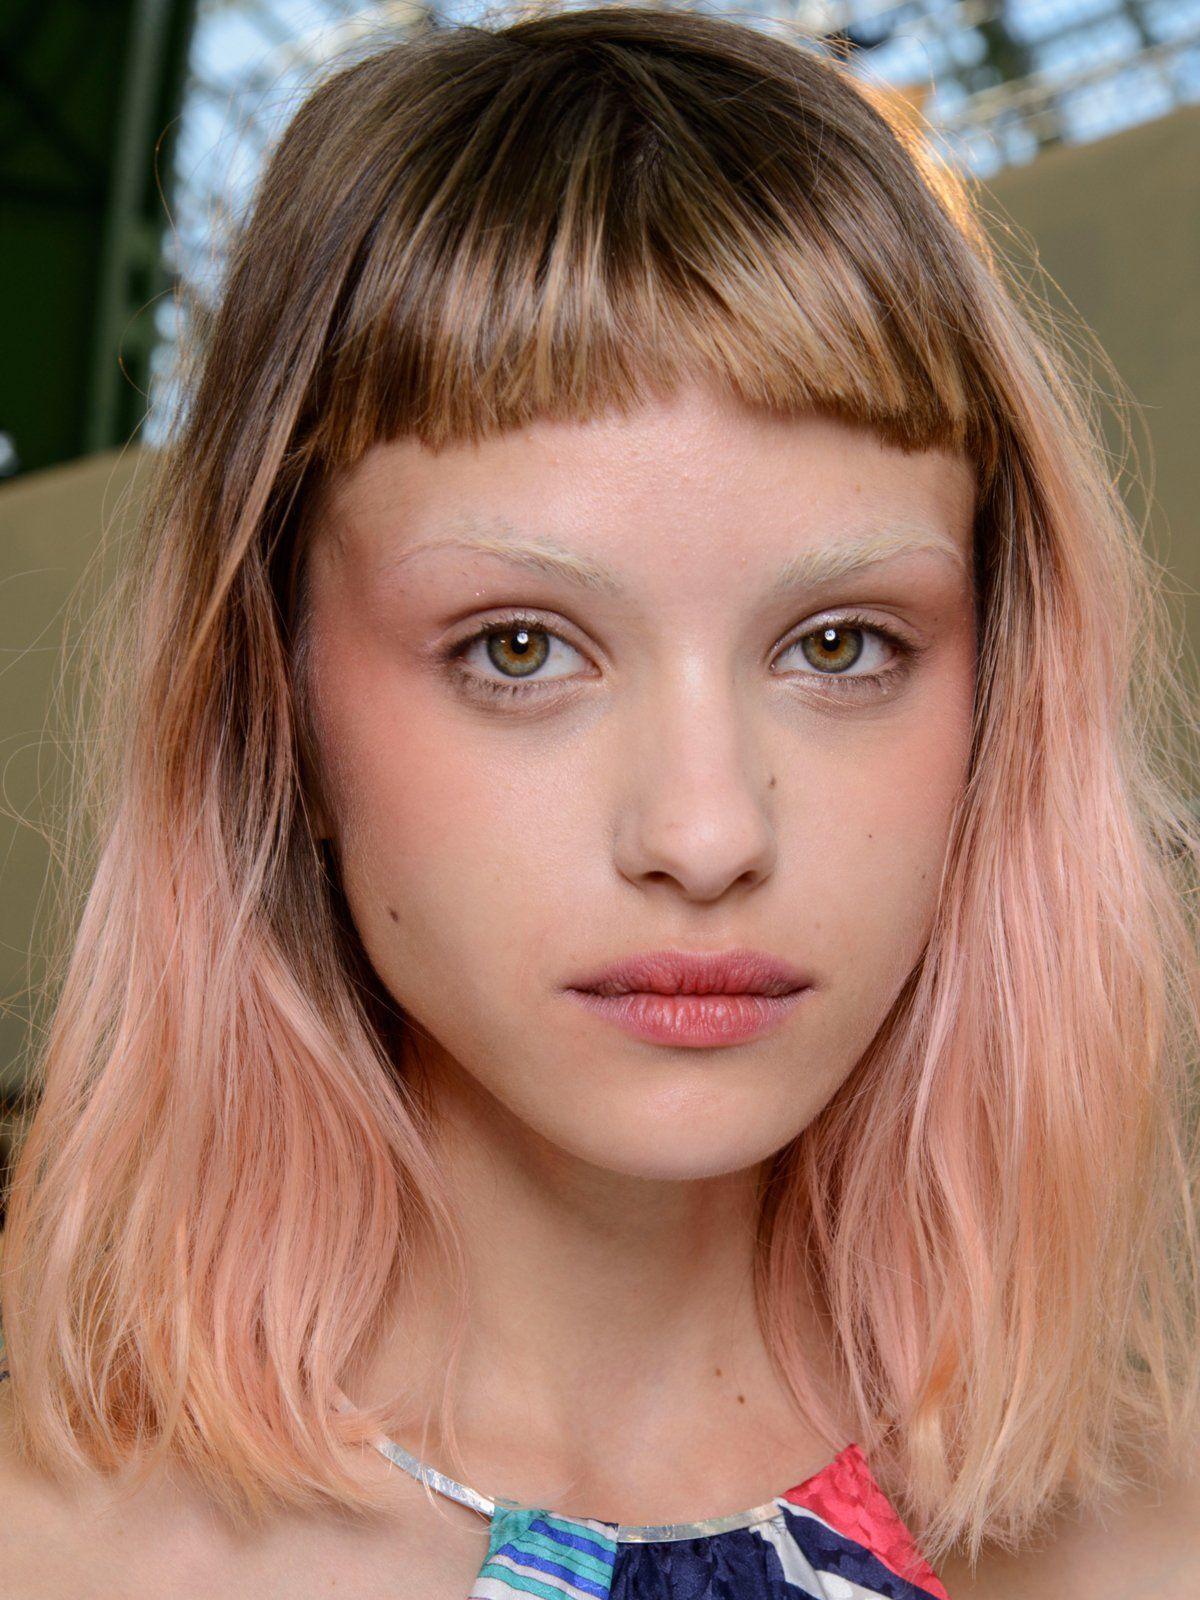 Frisuren Für Dickes Haar In 2018 Hair Pinterest Hair Bangs